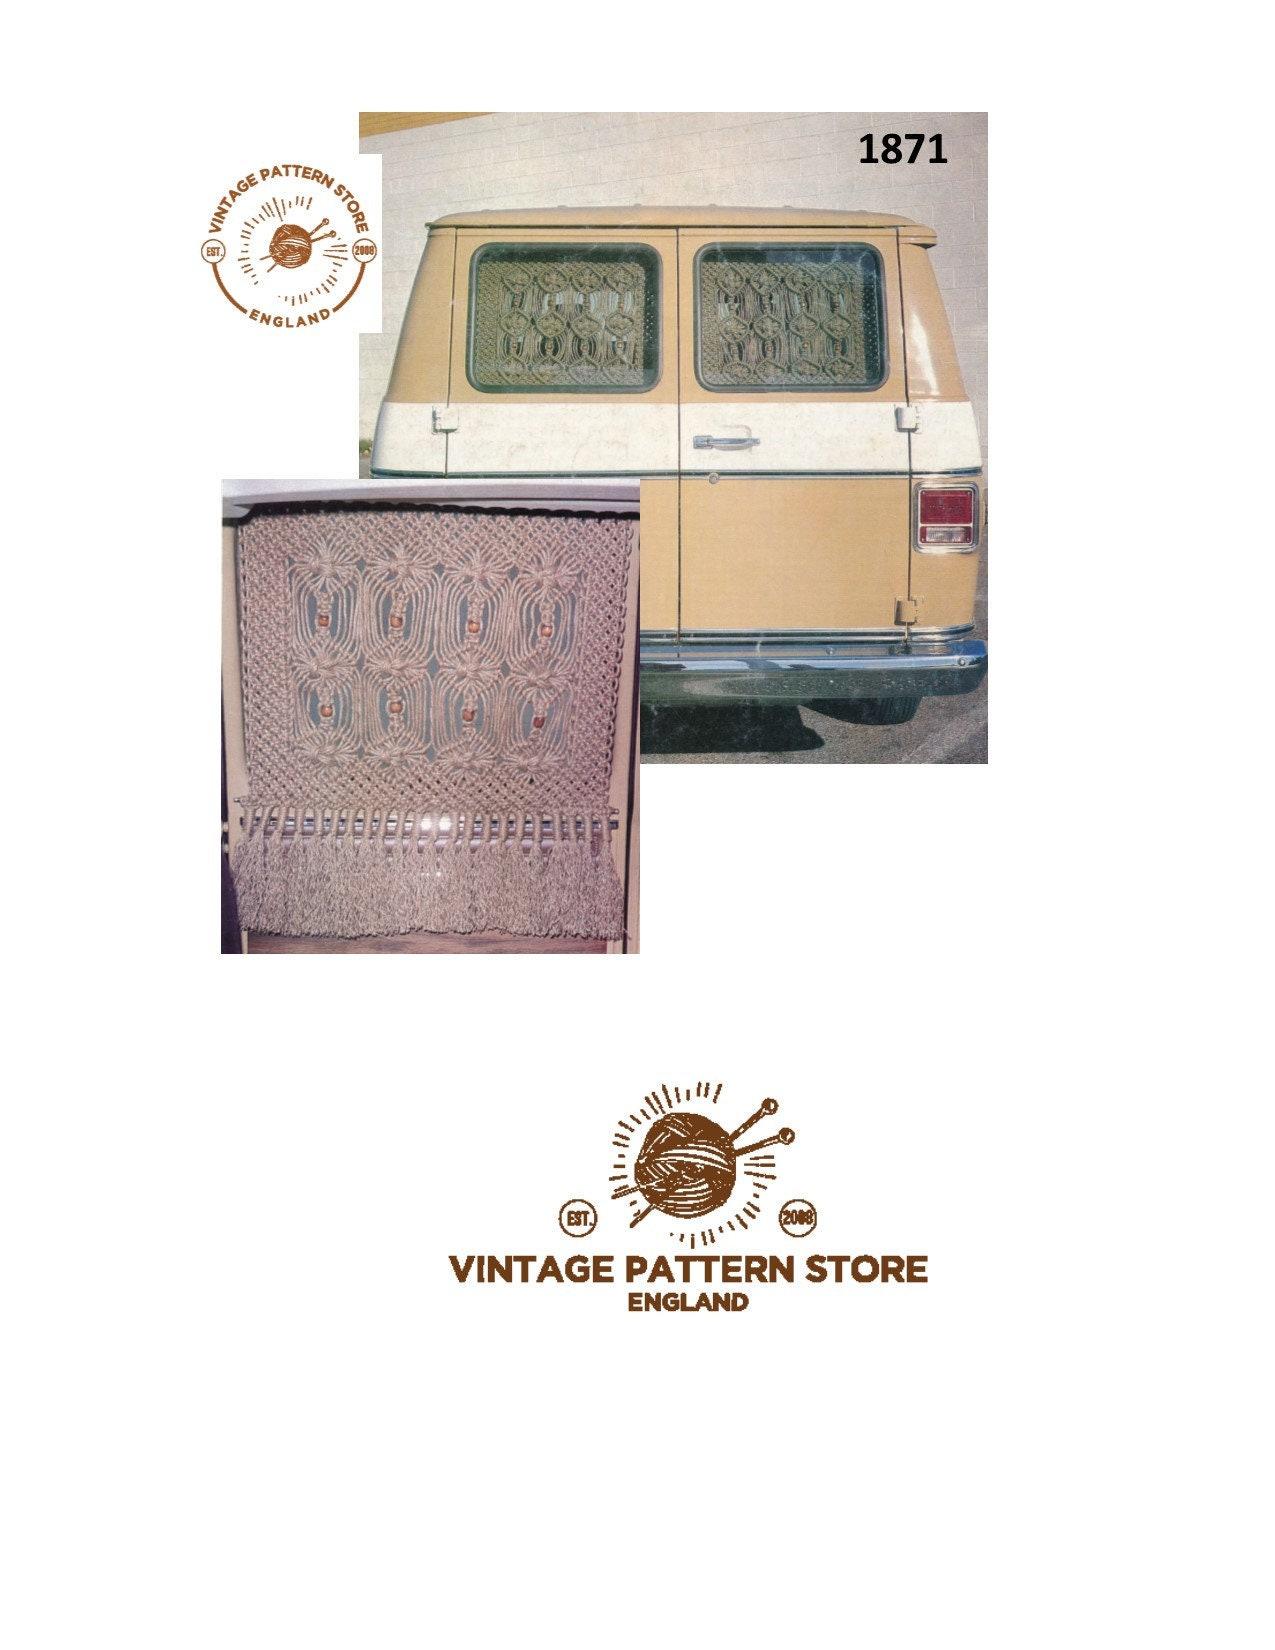 70s Vintage Camper Van Macrame Drapes Net Curtains Pdf Macrame Pattern Instant Pdf Download 1871